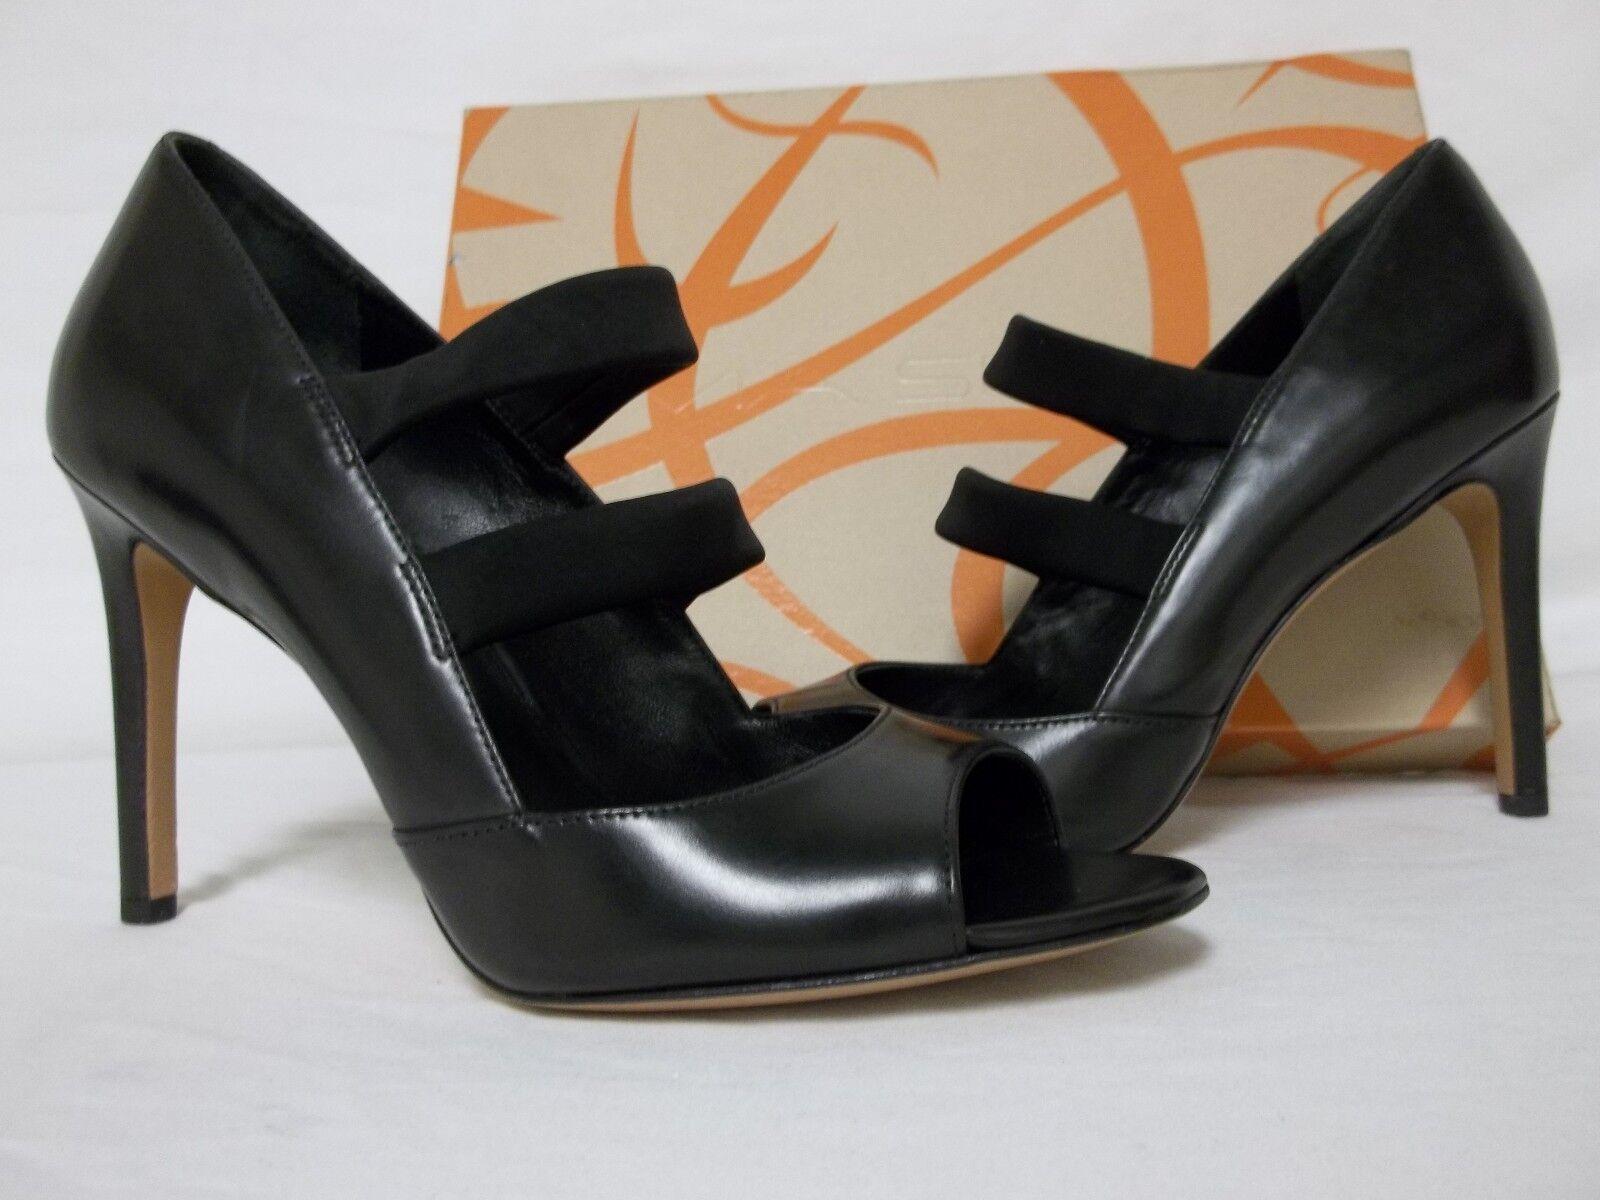 Via Spiga Size 6.5 M Ettie Ettie M Black Leather Ankle Strap Heels New Womens Shoes 41b436